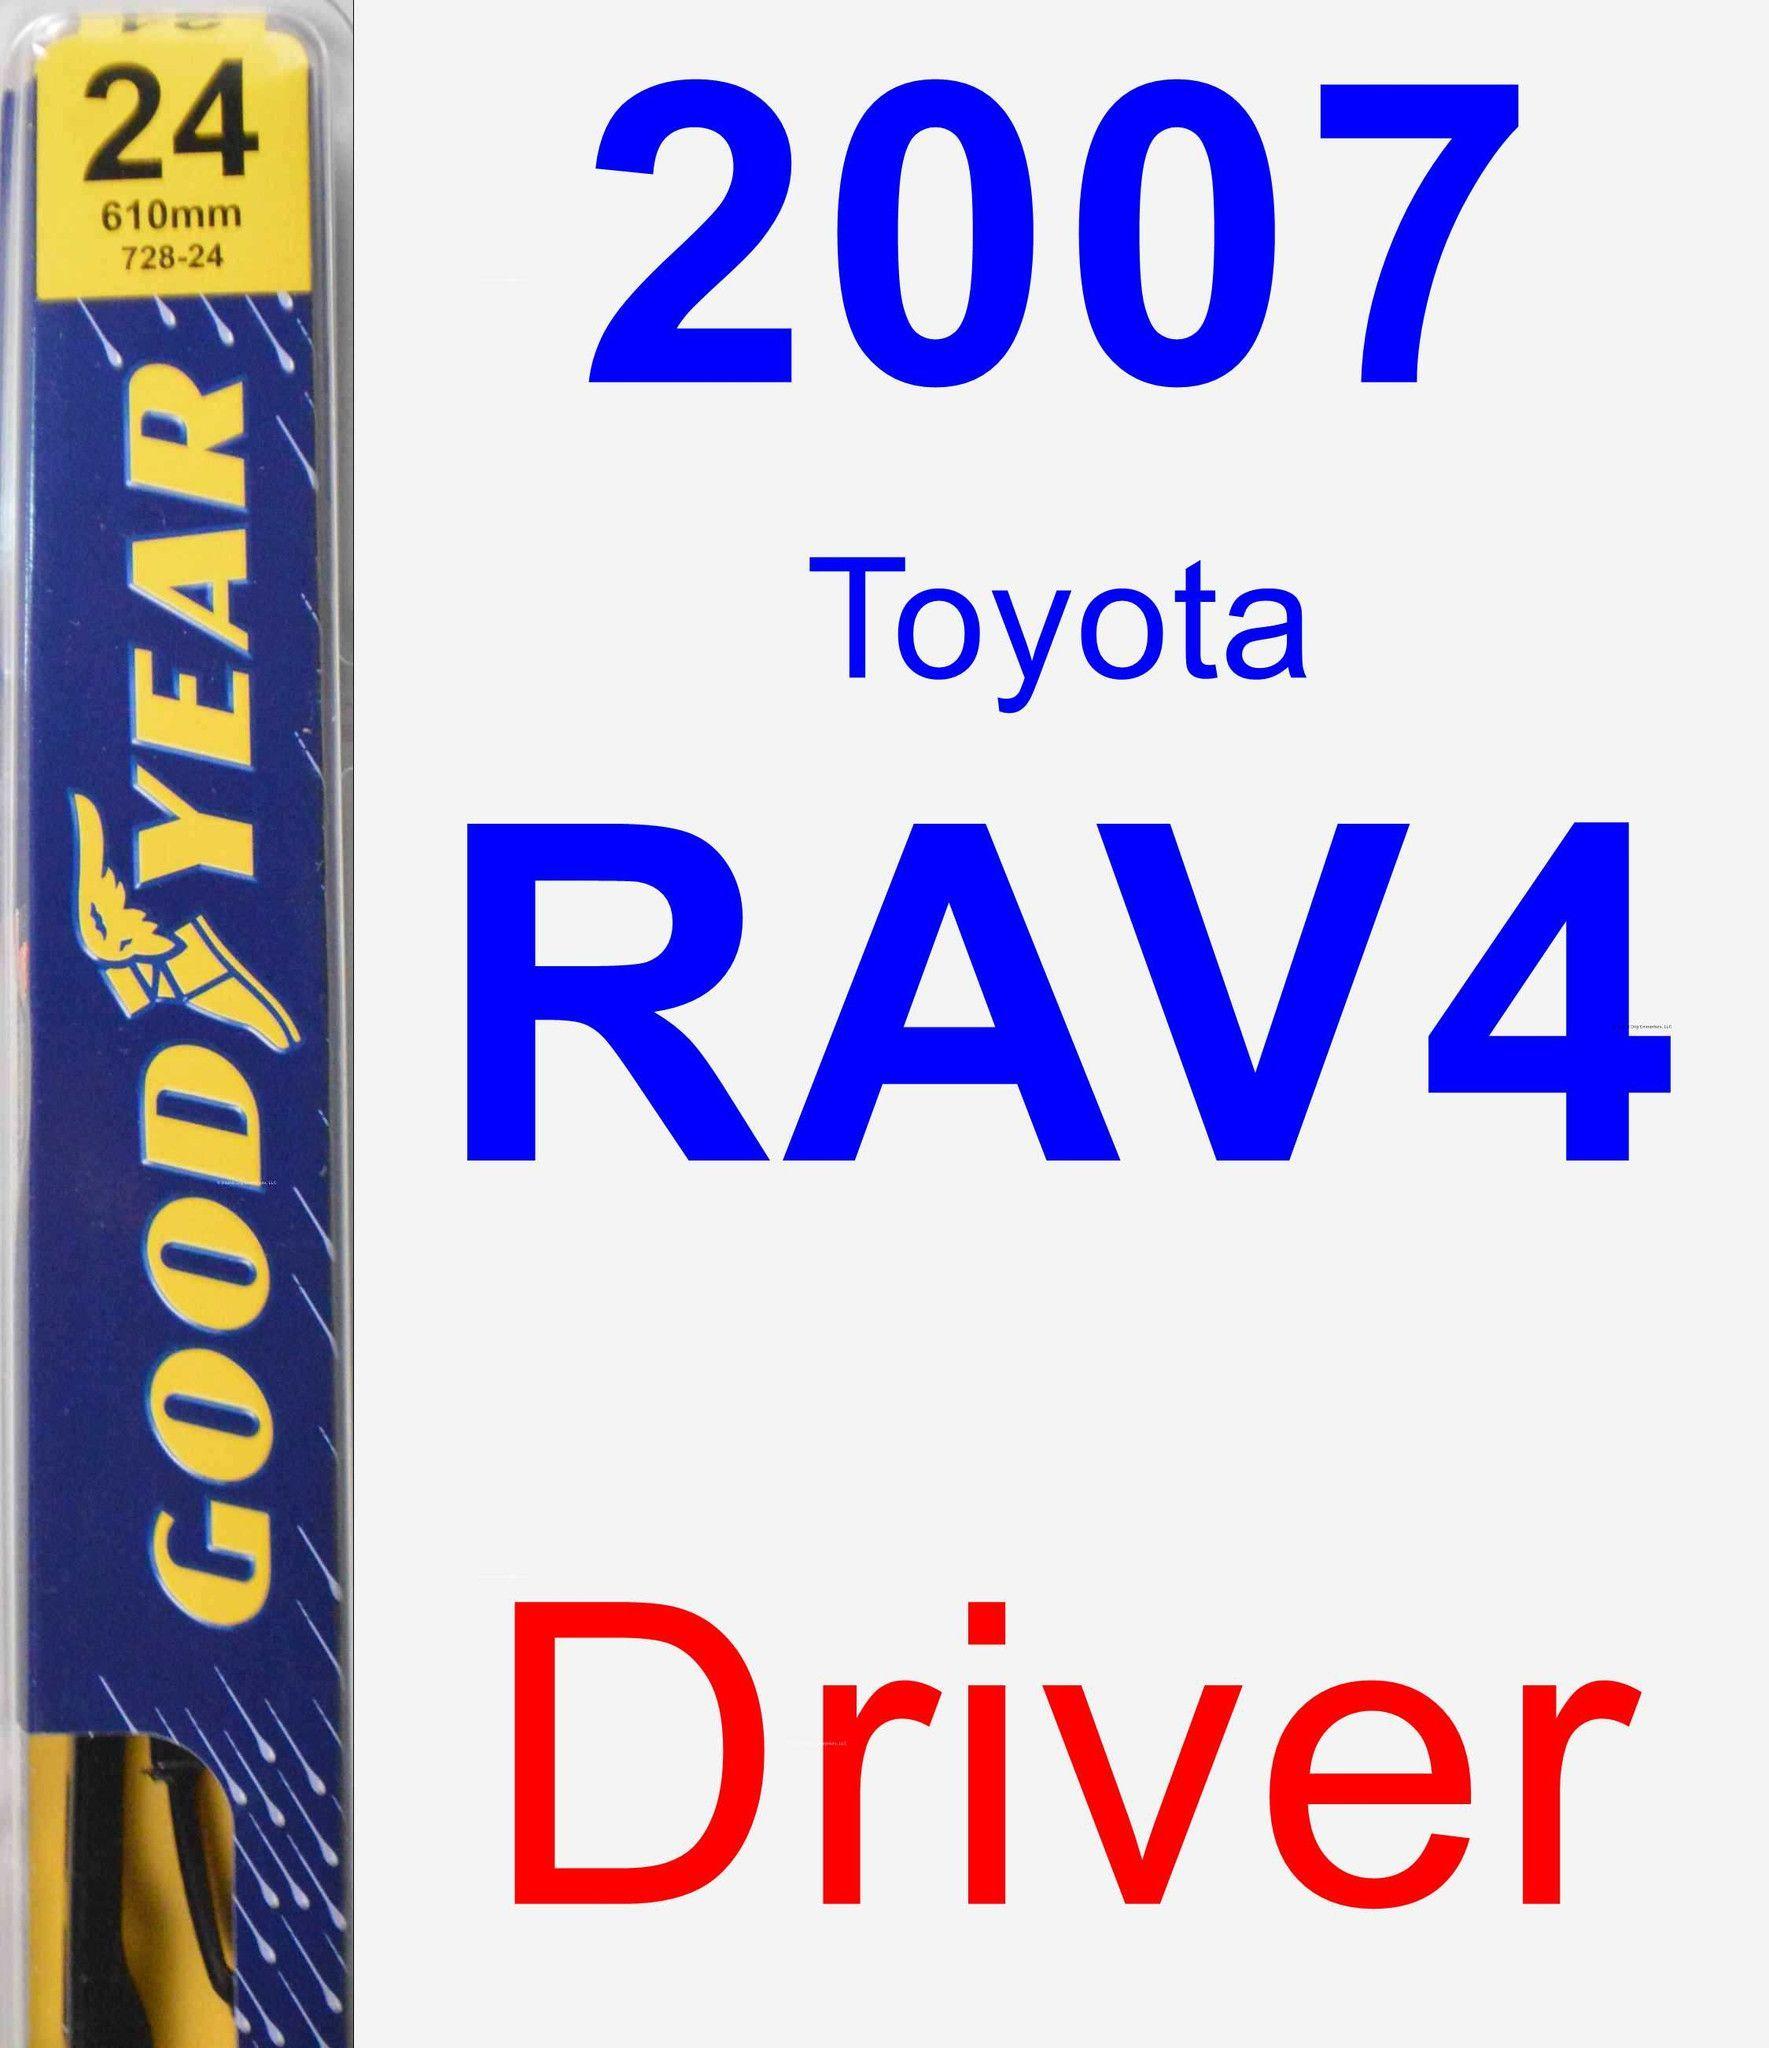 Driver Wiper Blade For 2007 Toyota RAV4 - Premium